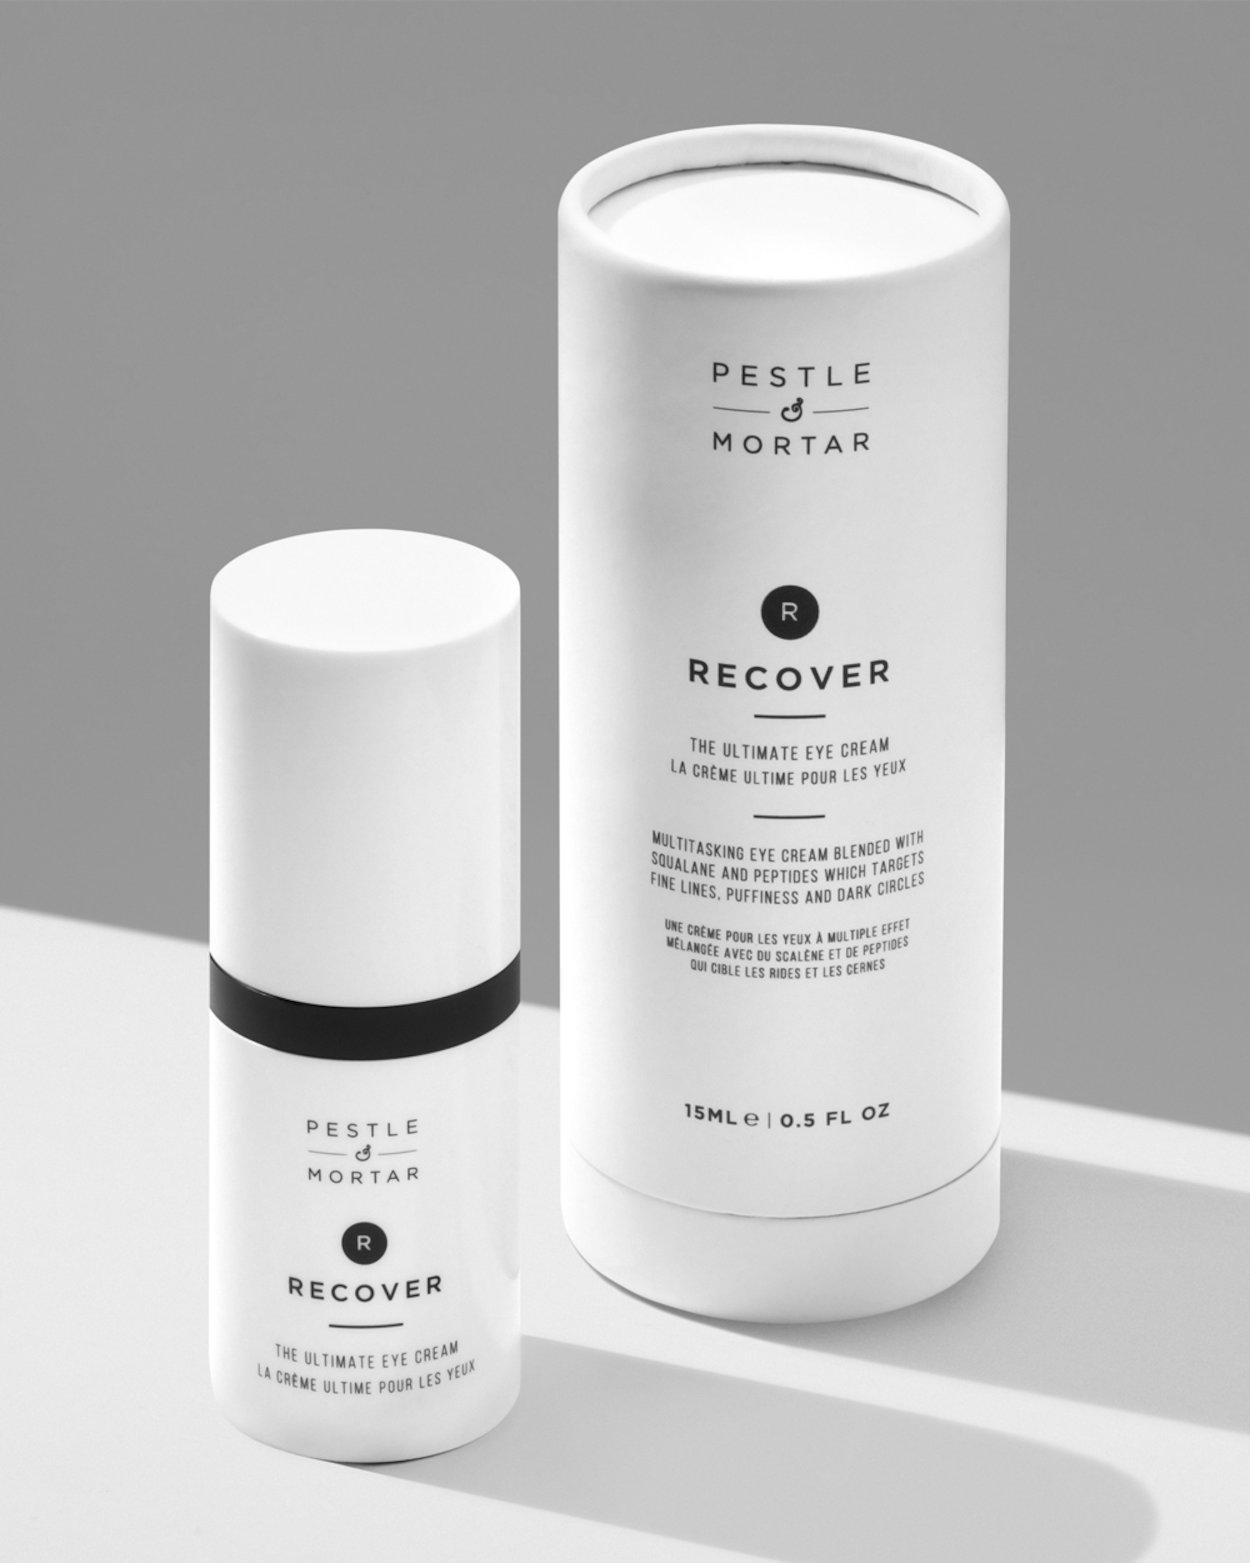 Pestle and Mortar Recover Eye Cream